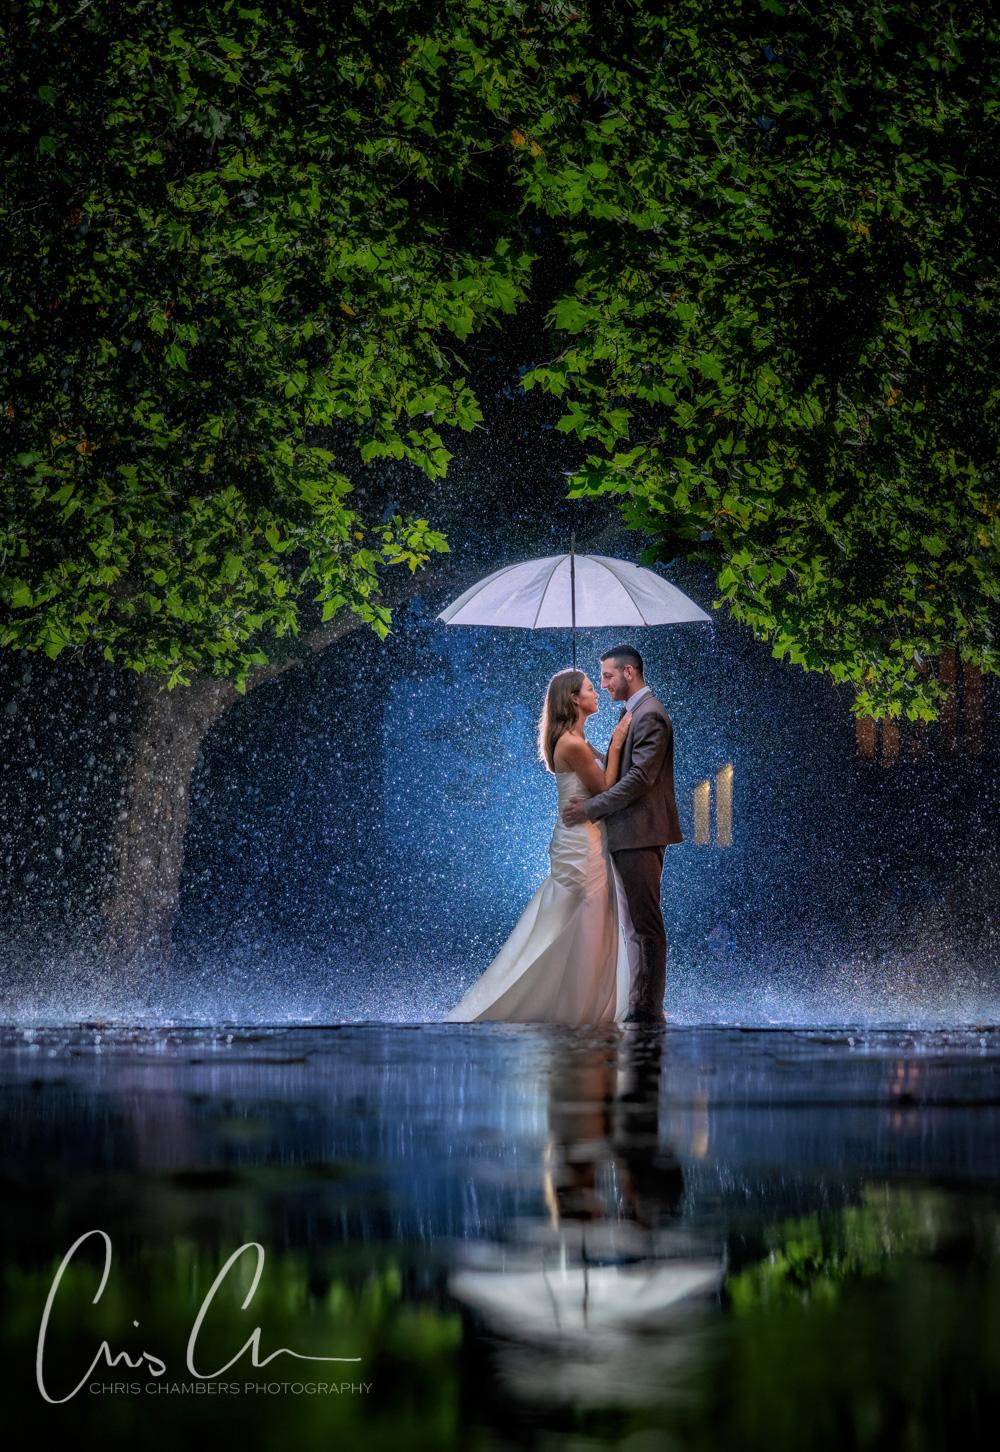 Wedding photography hints and tips - York wedding photography